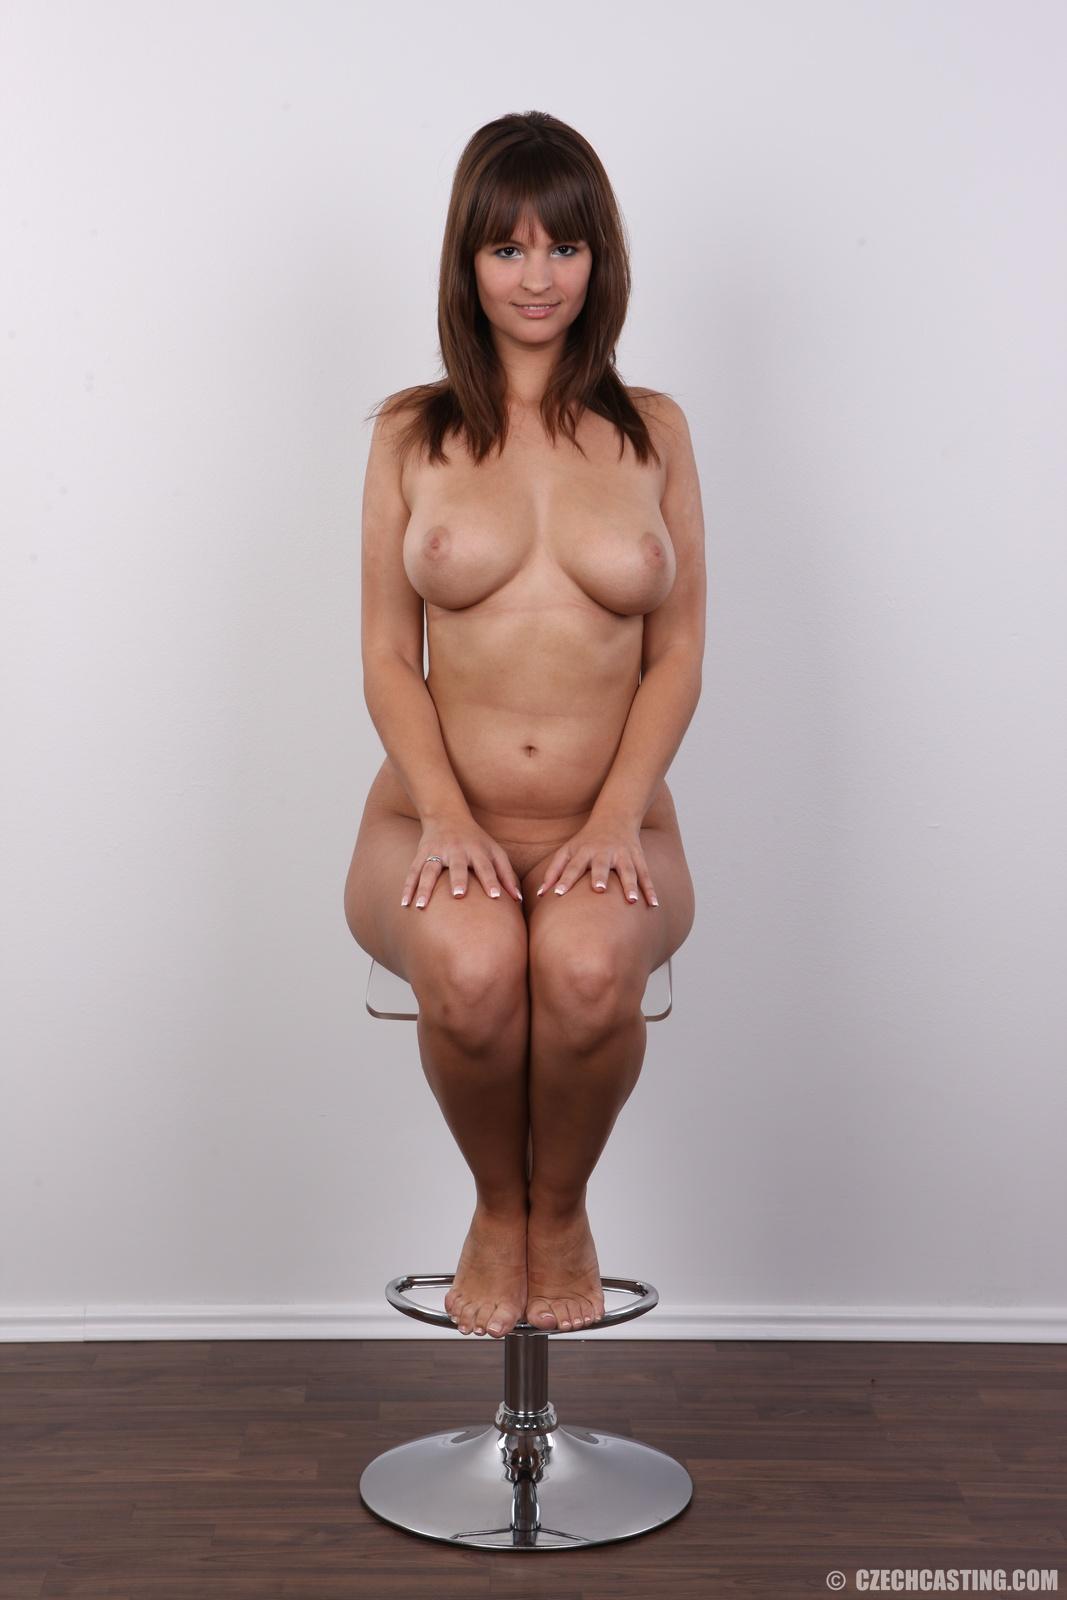 Порно риту аргилес смотреть онлайн фото 74-46